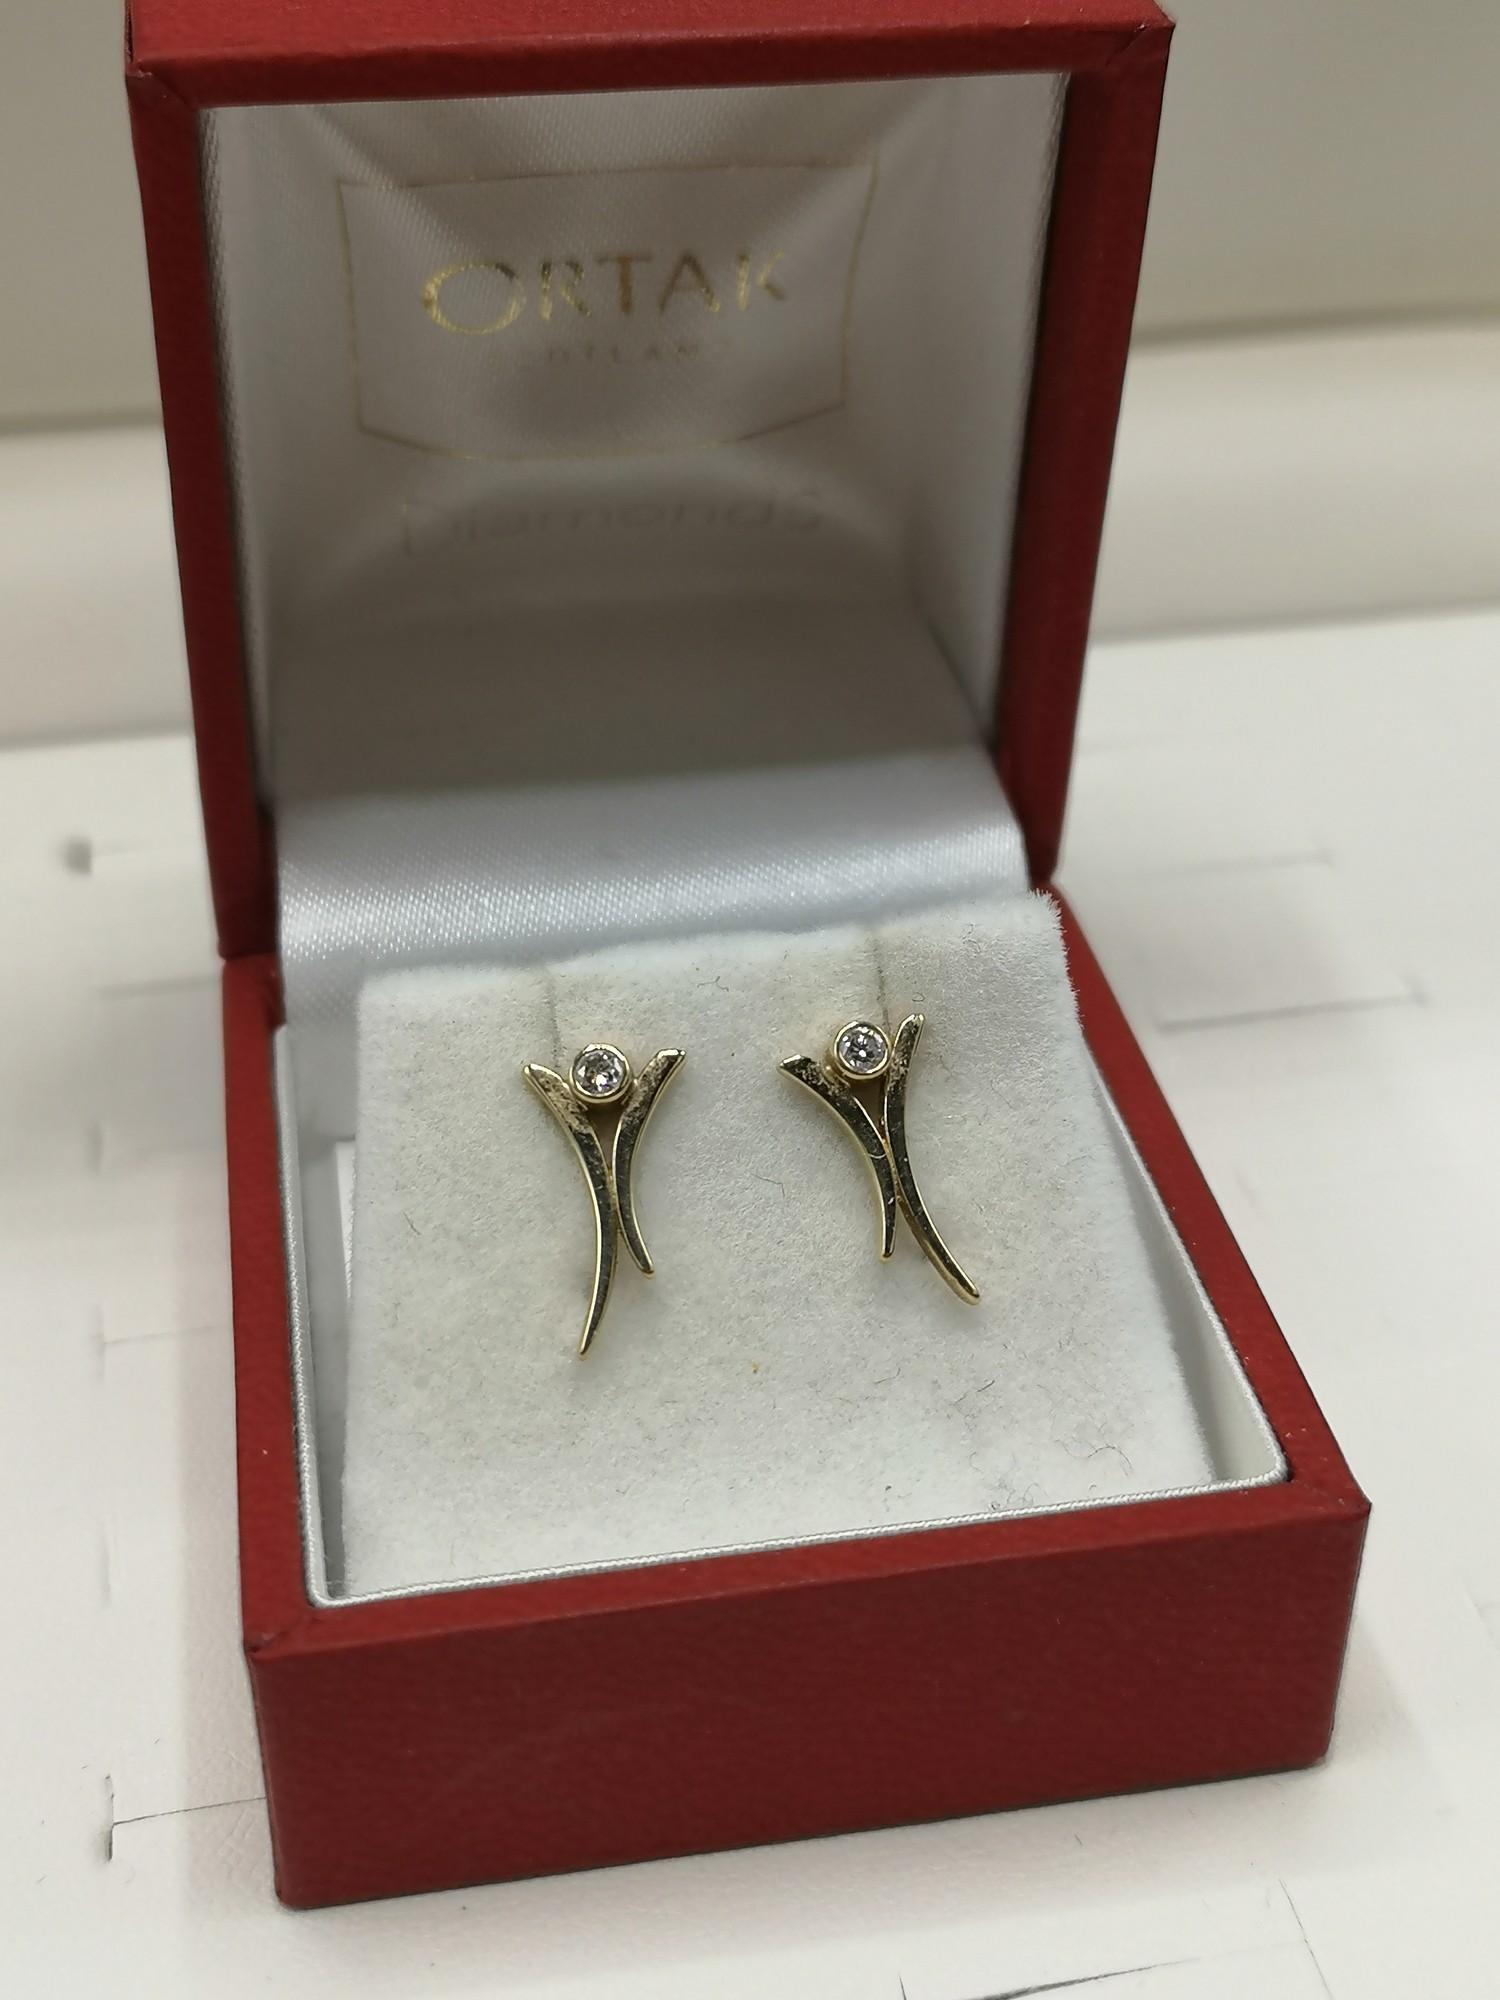 9ct gold ortak earrings set with diamonds.